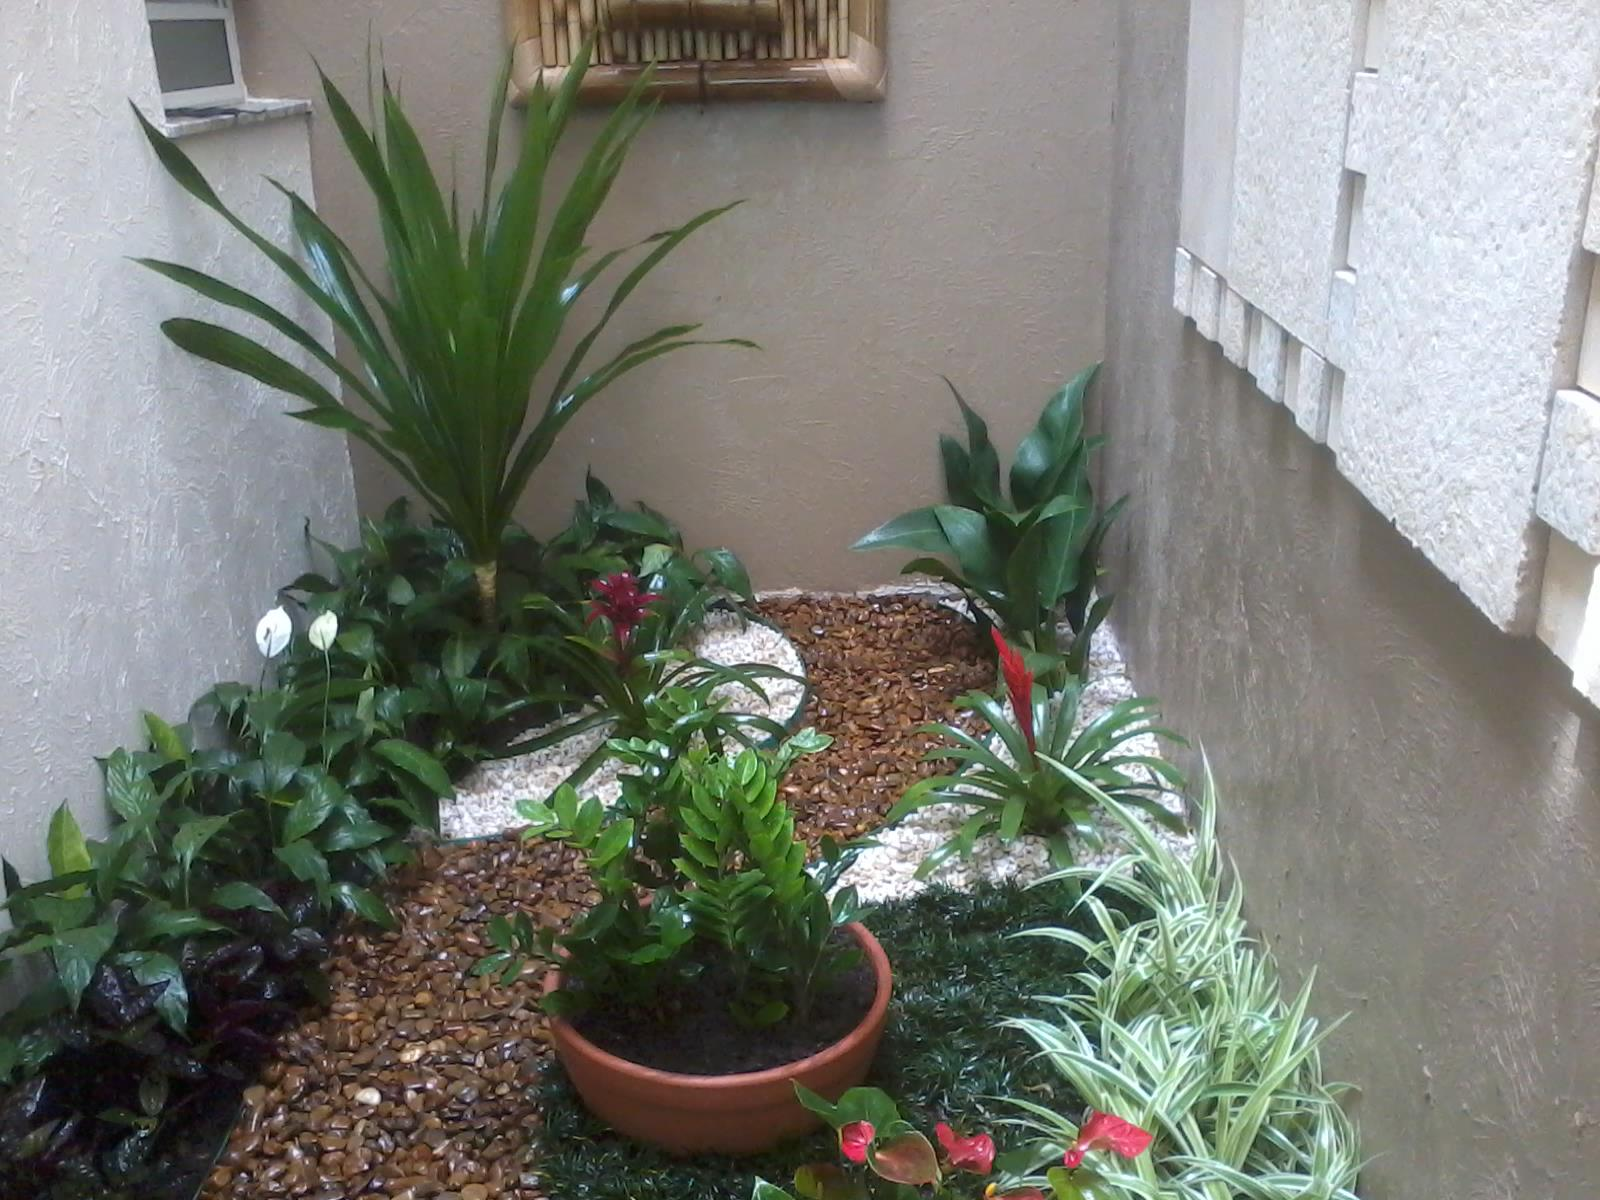 flores para jardim de inverno:Tipos de flores para jardim interno e de inverno